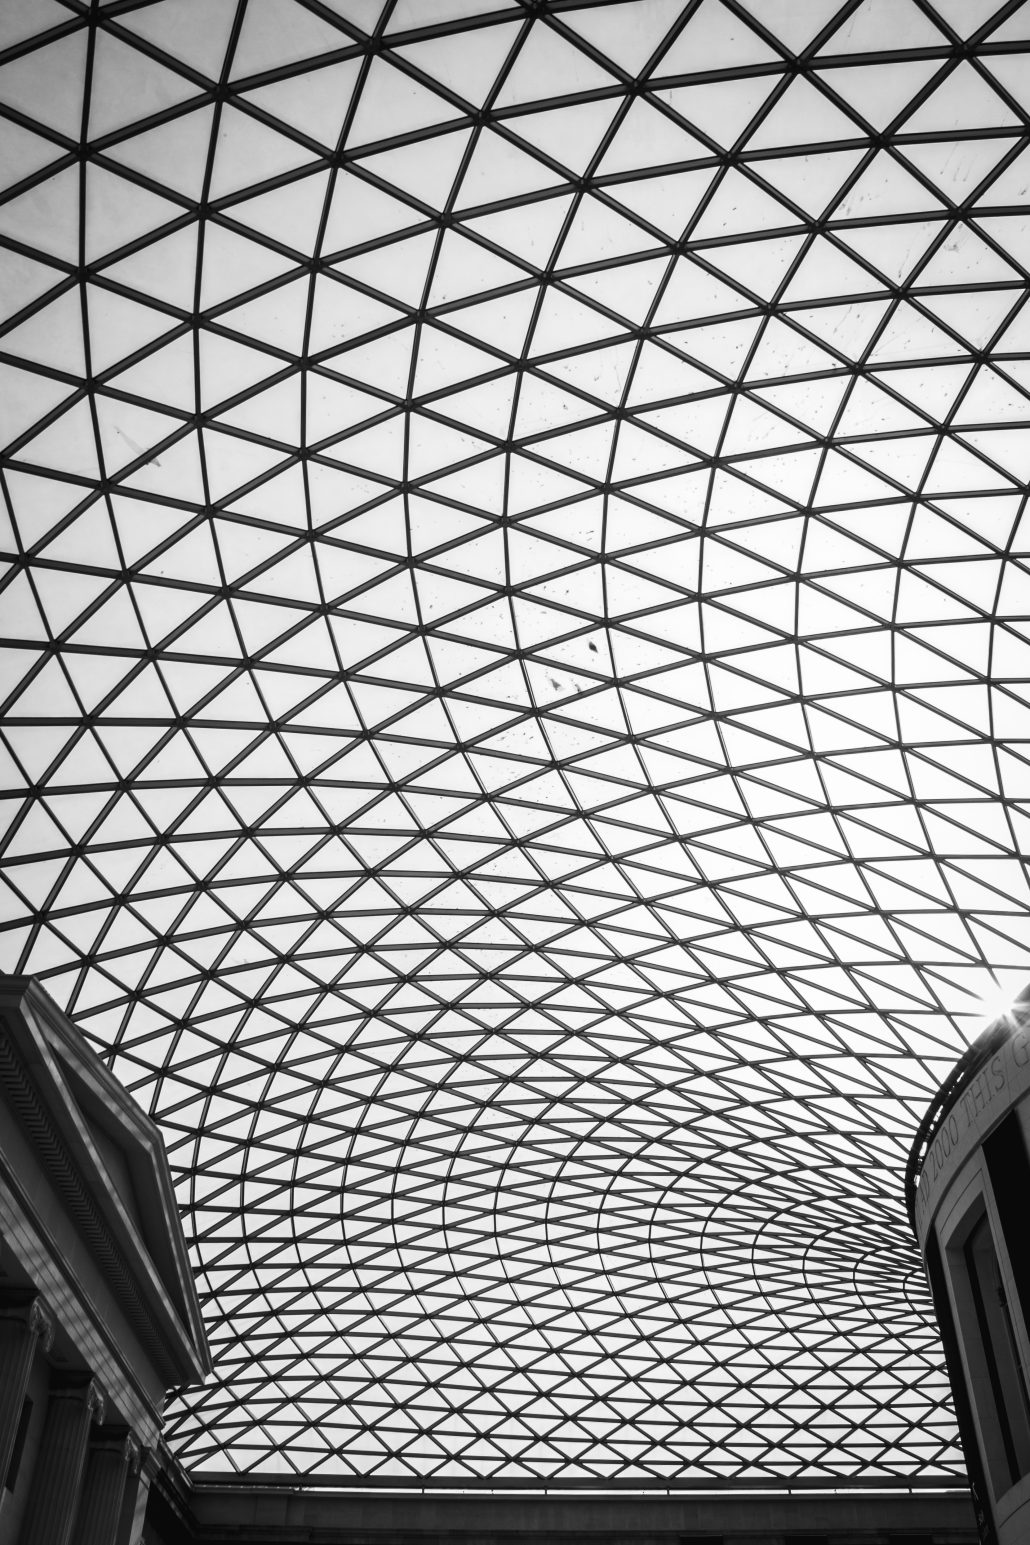 British Museum / Foster + Partners